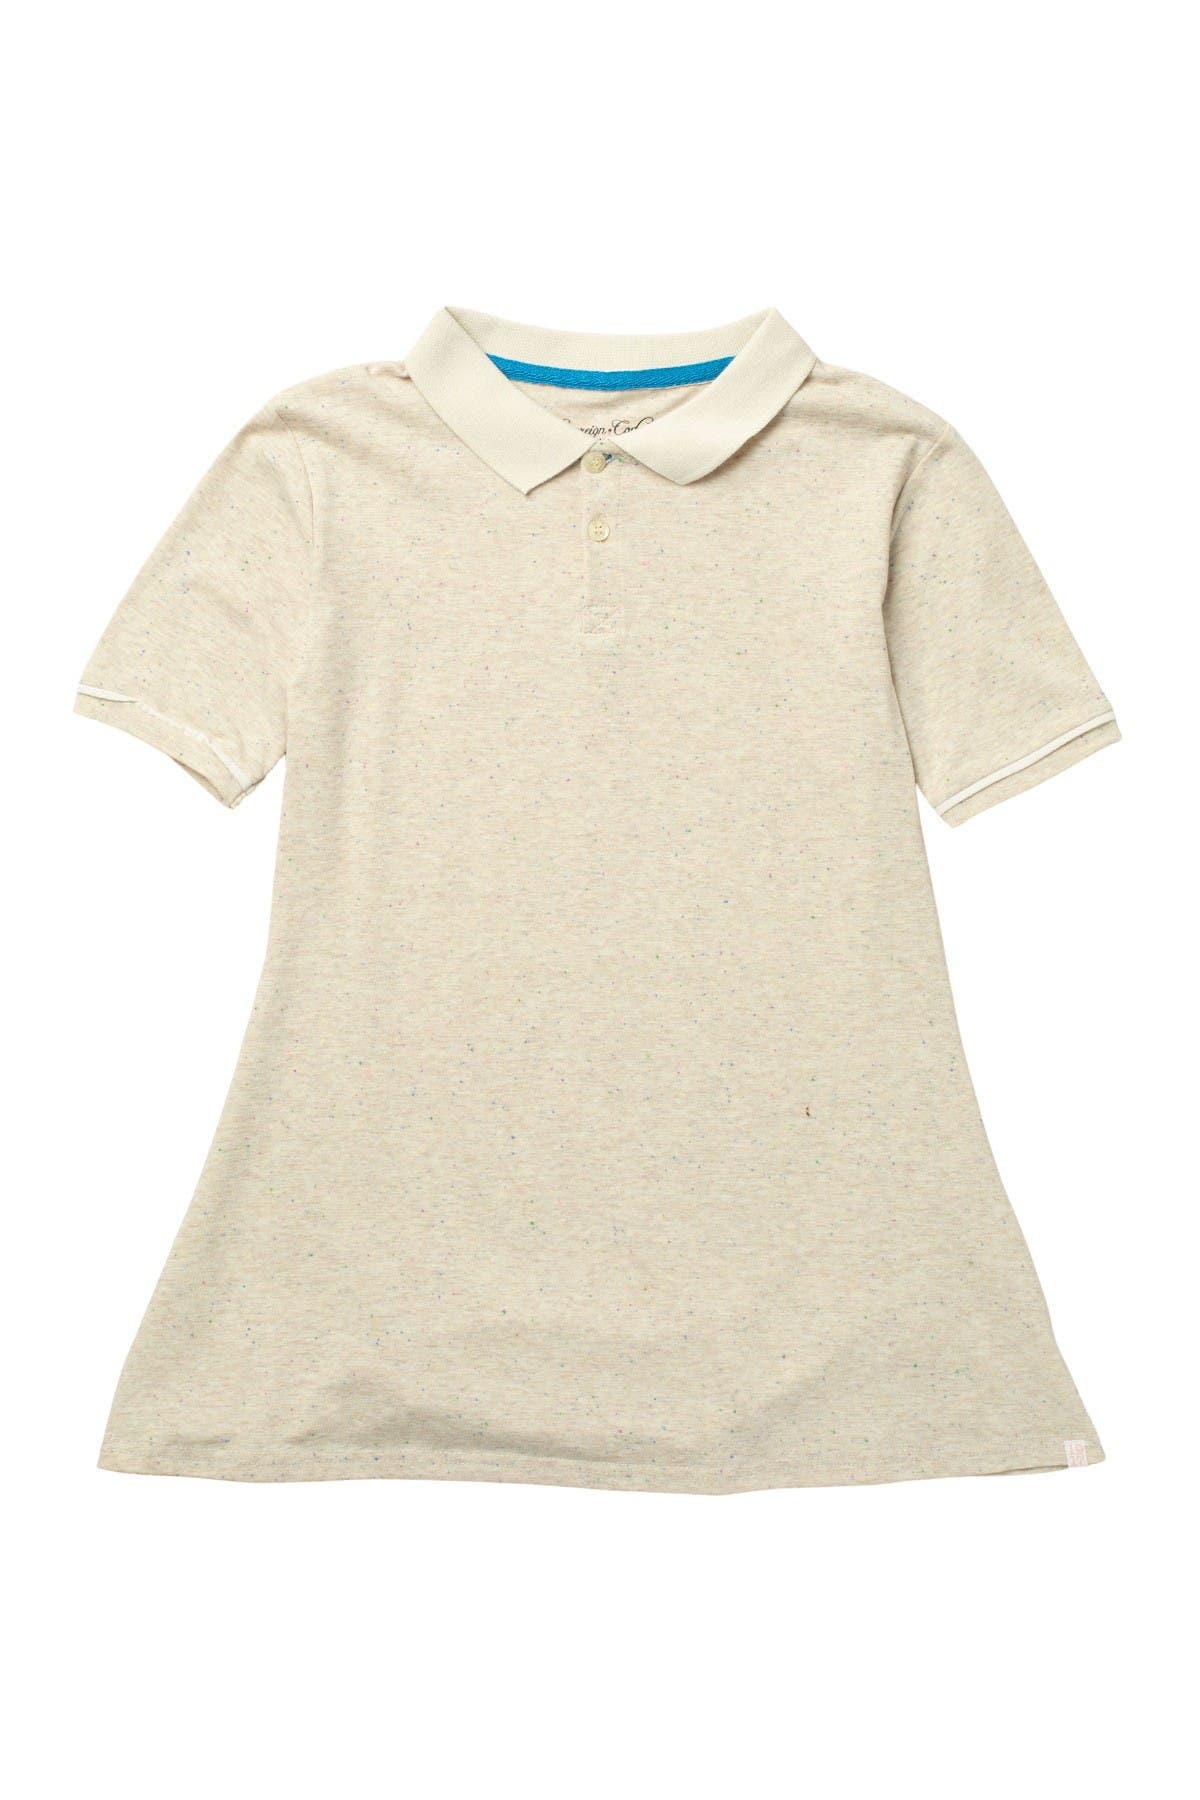 Image of Sovereign Code Bernice Polo Shirt Dress